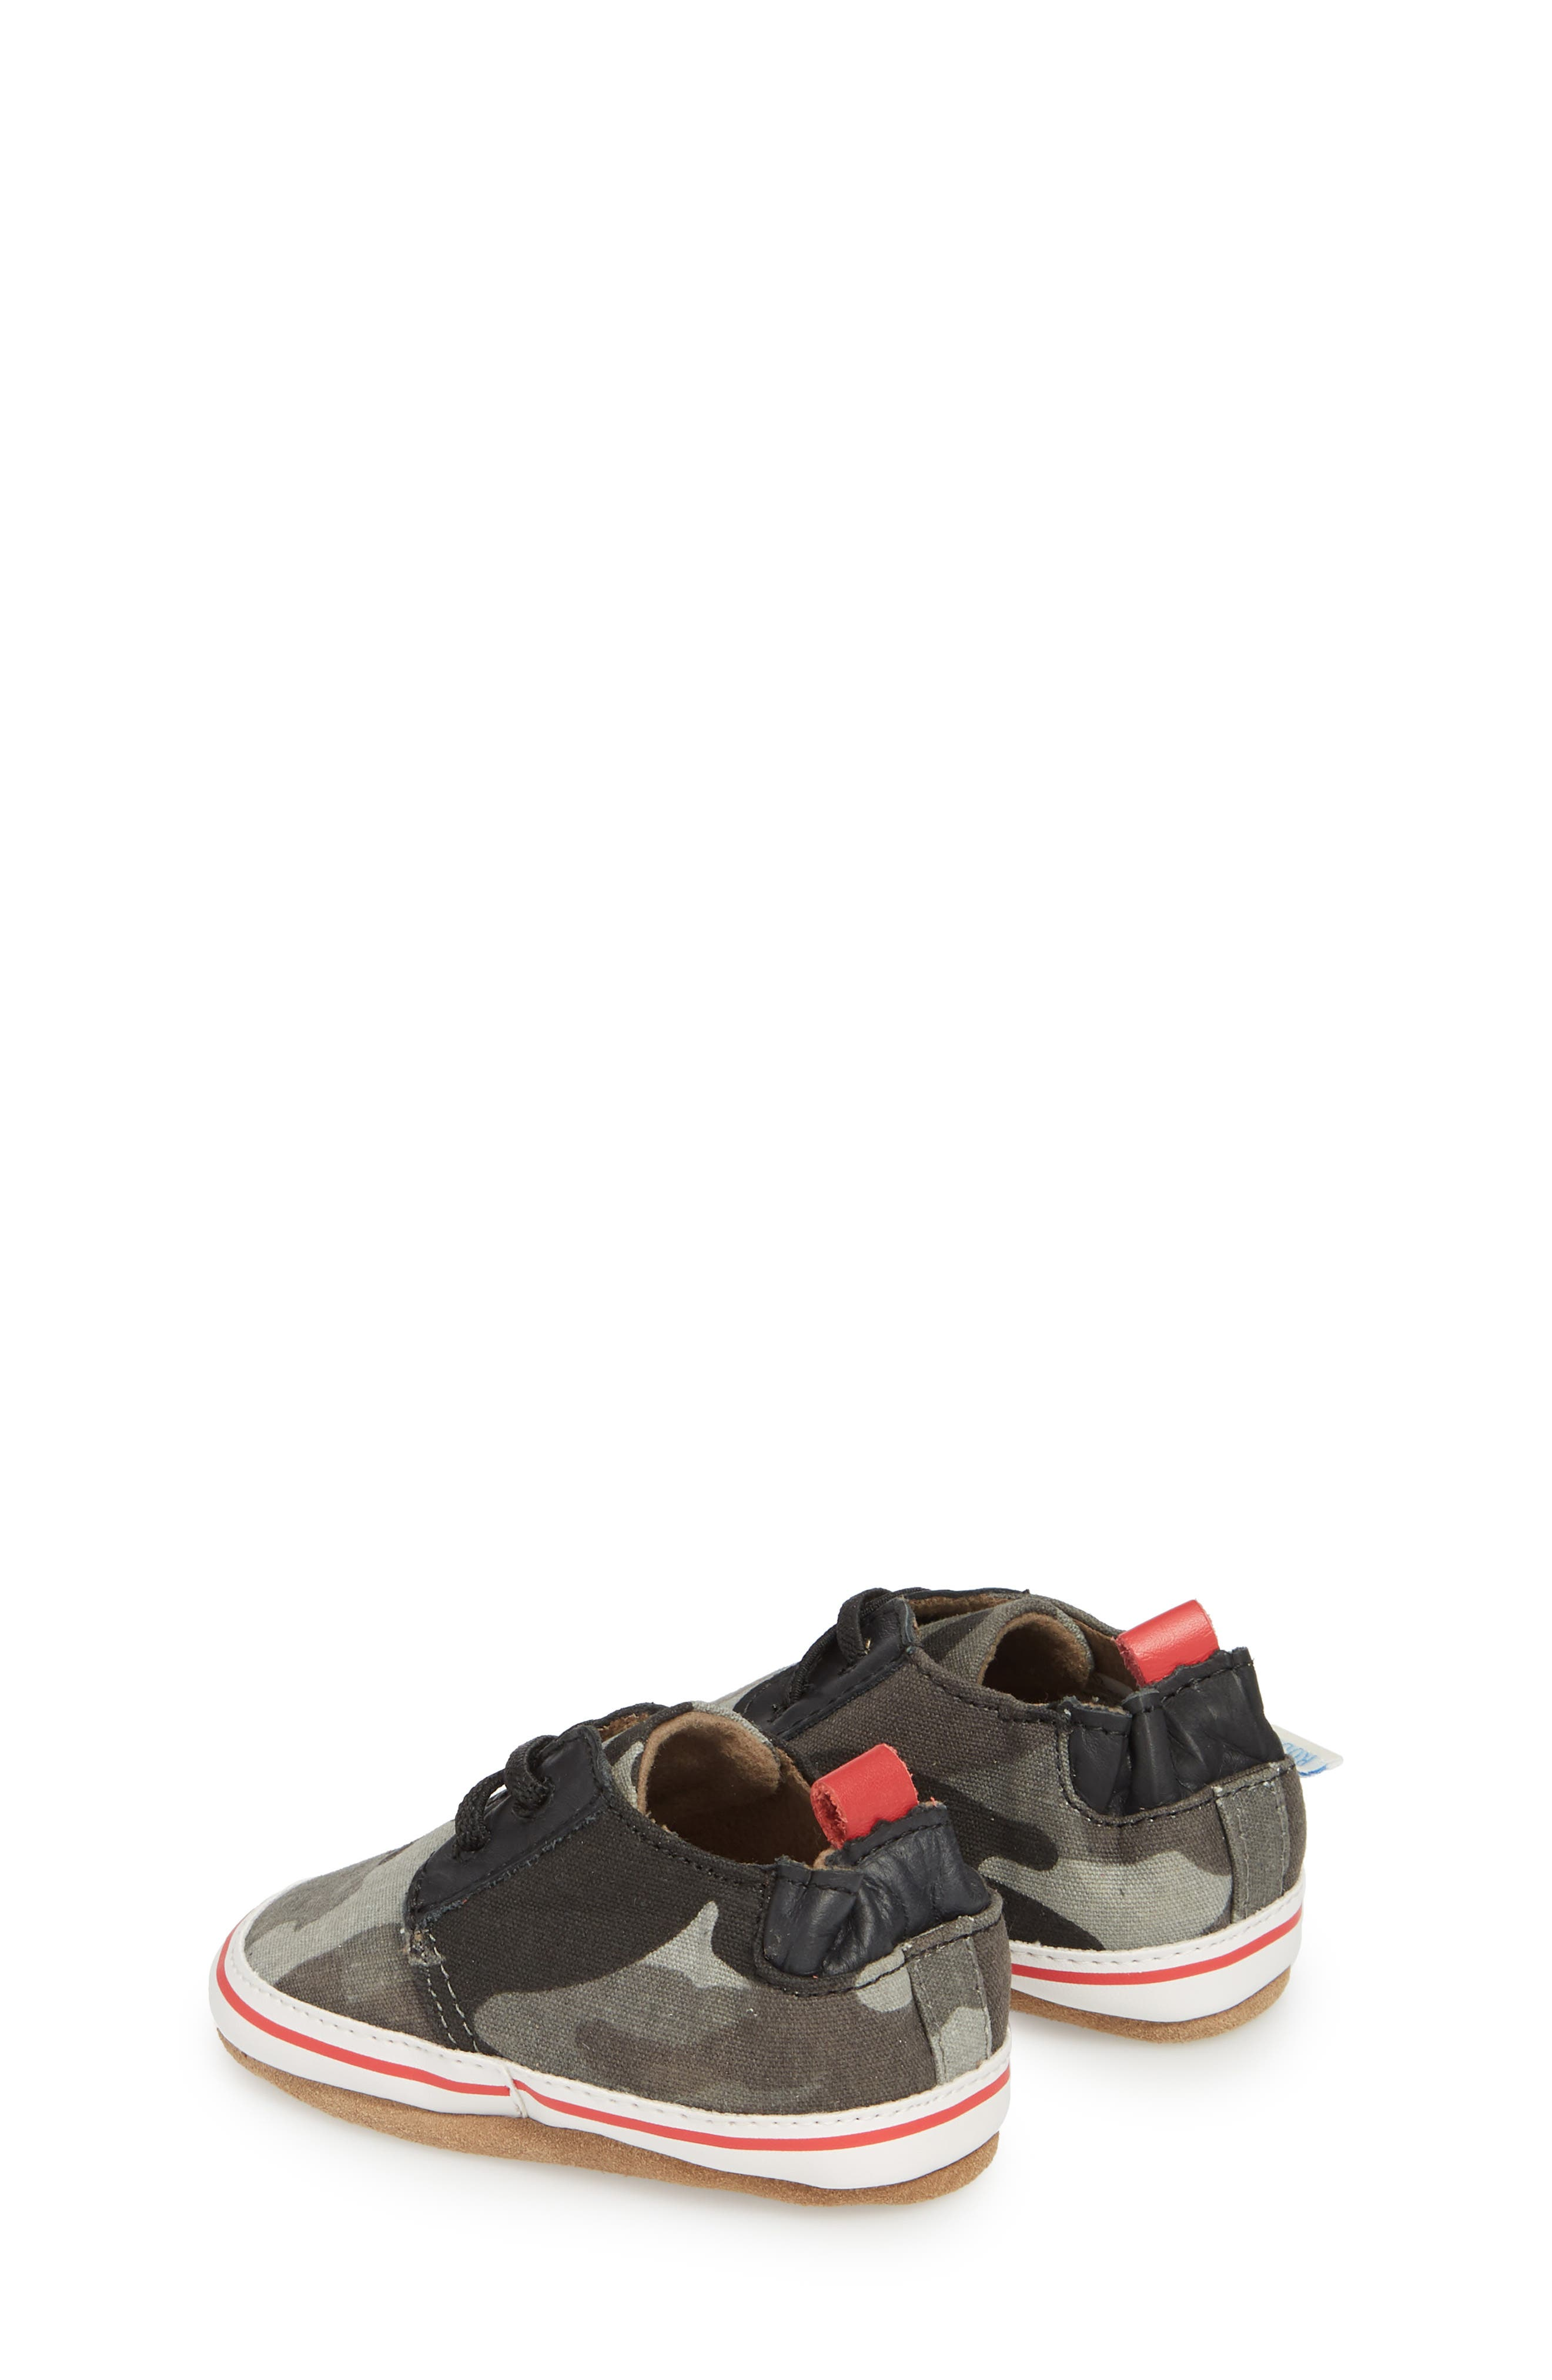 Cool & Casual Camo Print Crib Shoe,                             Alternate thumbnail 2, color,                             020